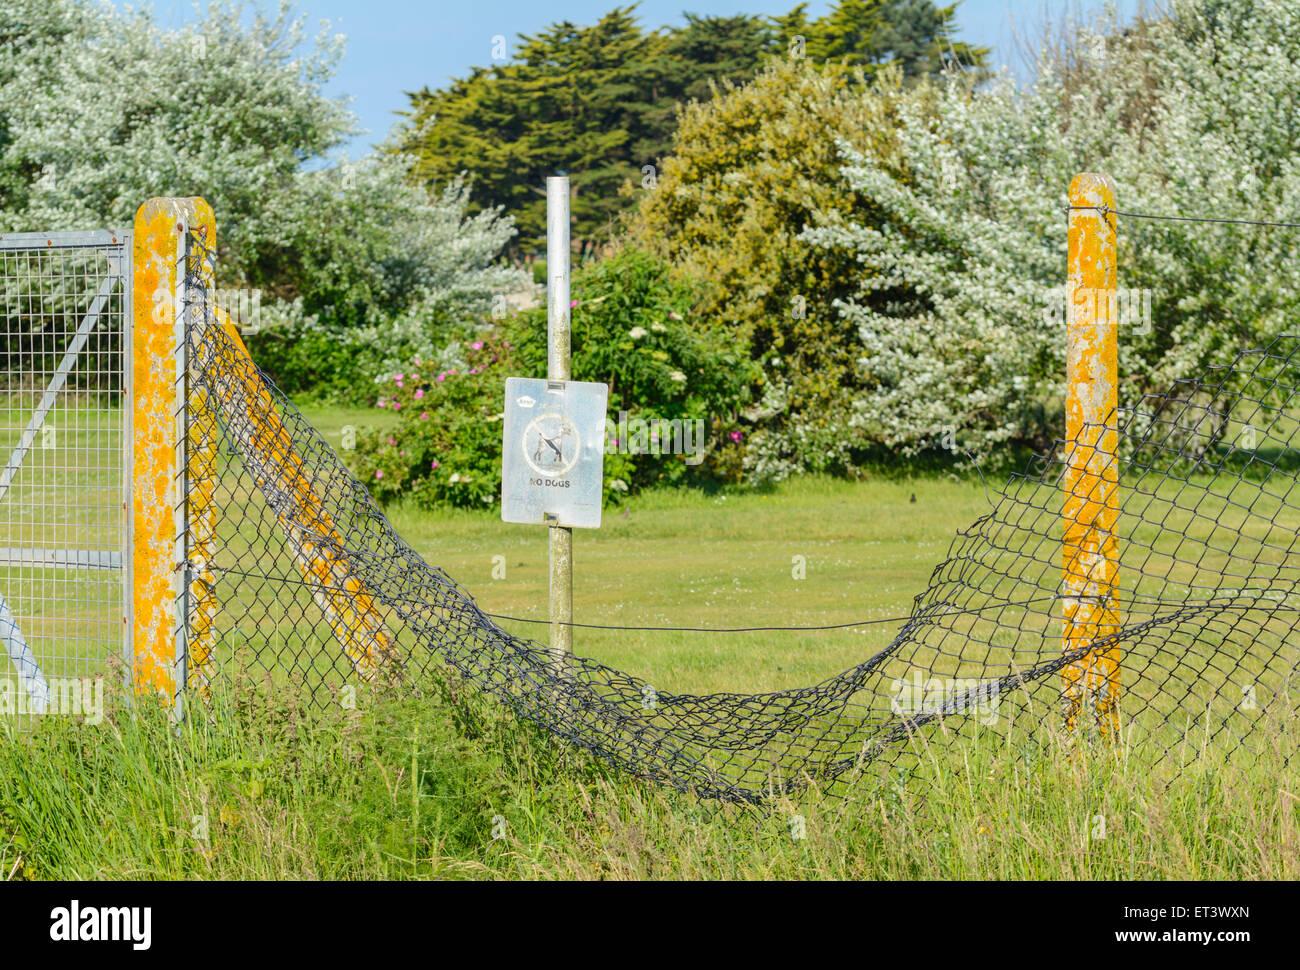 Vandalised mesh metal fence. - Stock Image